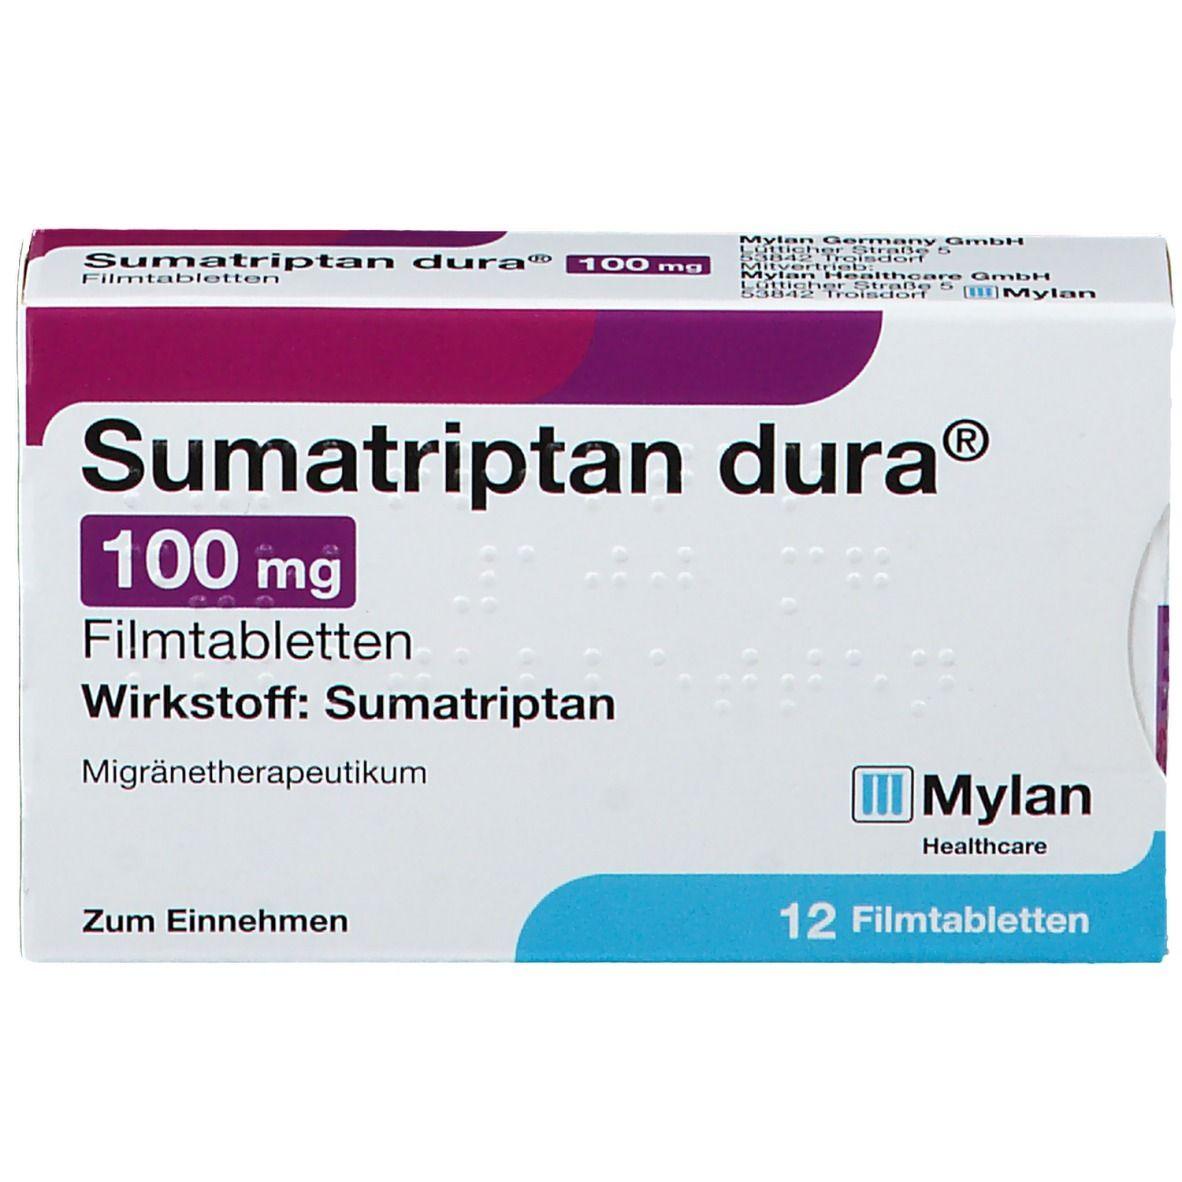 Sumatriptan dura® 100 mg 12 St - shop-apotheke.com